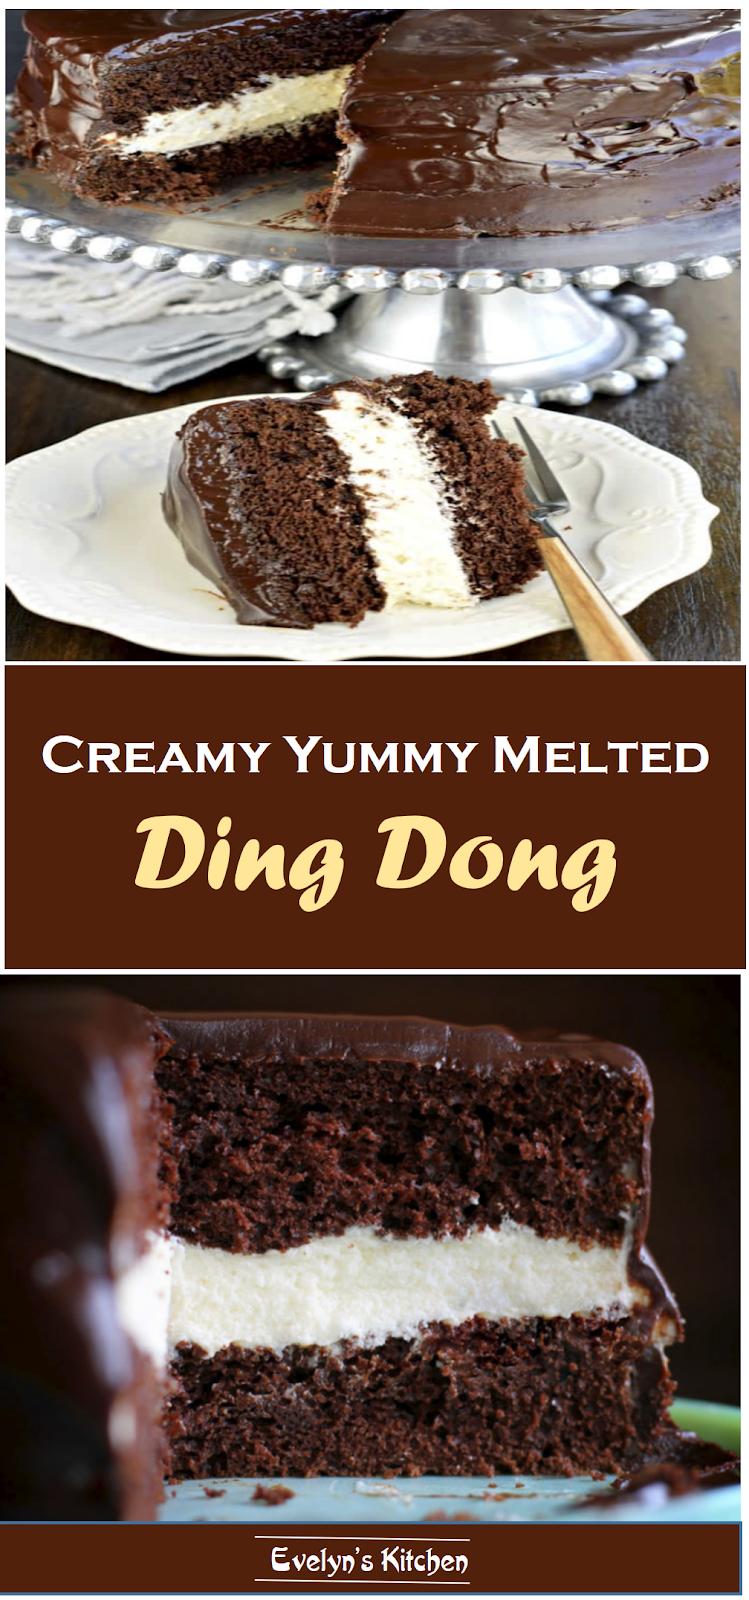 #Chocolatecake #Dingdongcake #Erminfrosting #Desserts